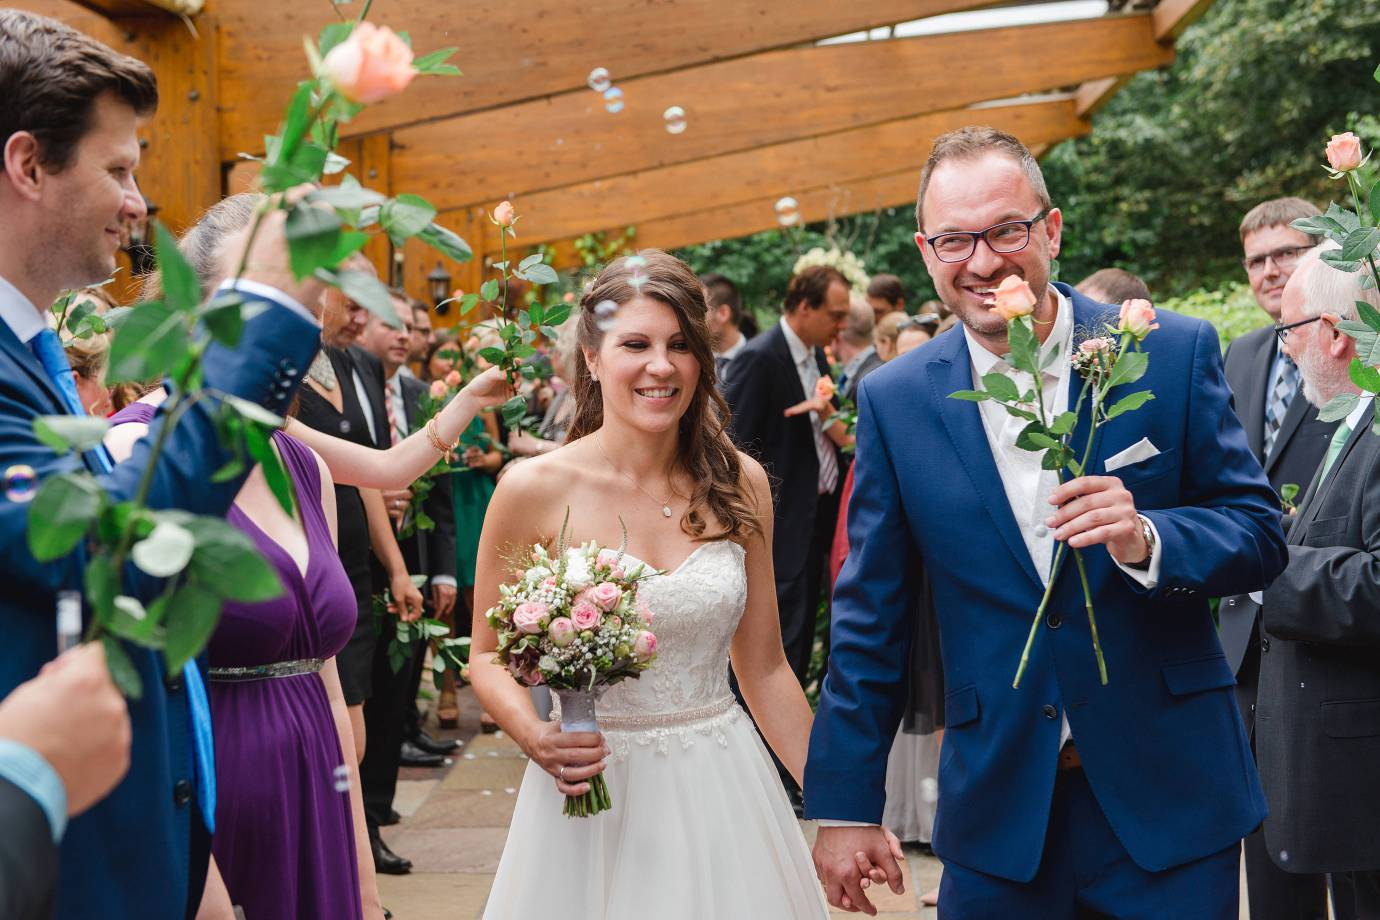 hochzeitsfotograf ganderkesee 110 - Christina+Andreas